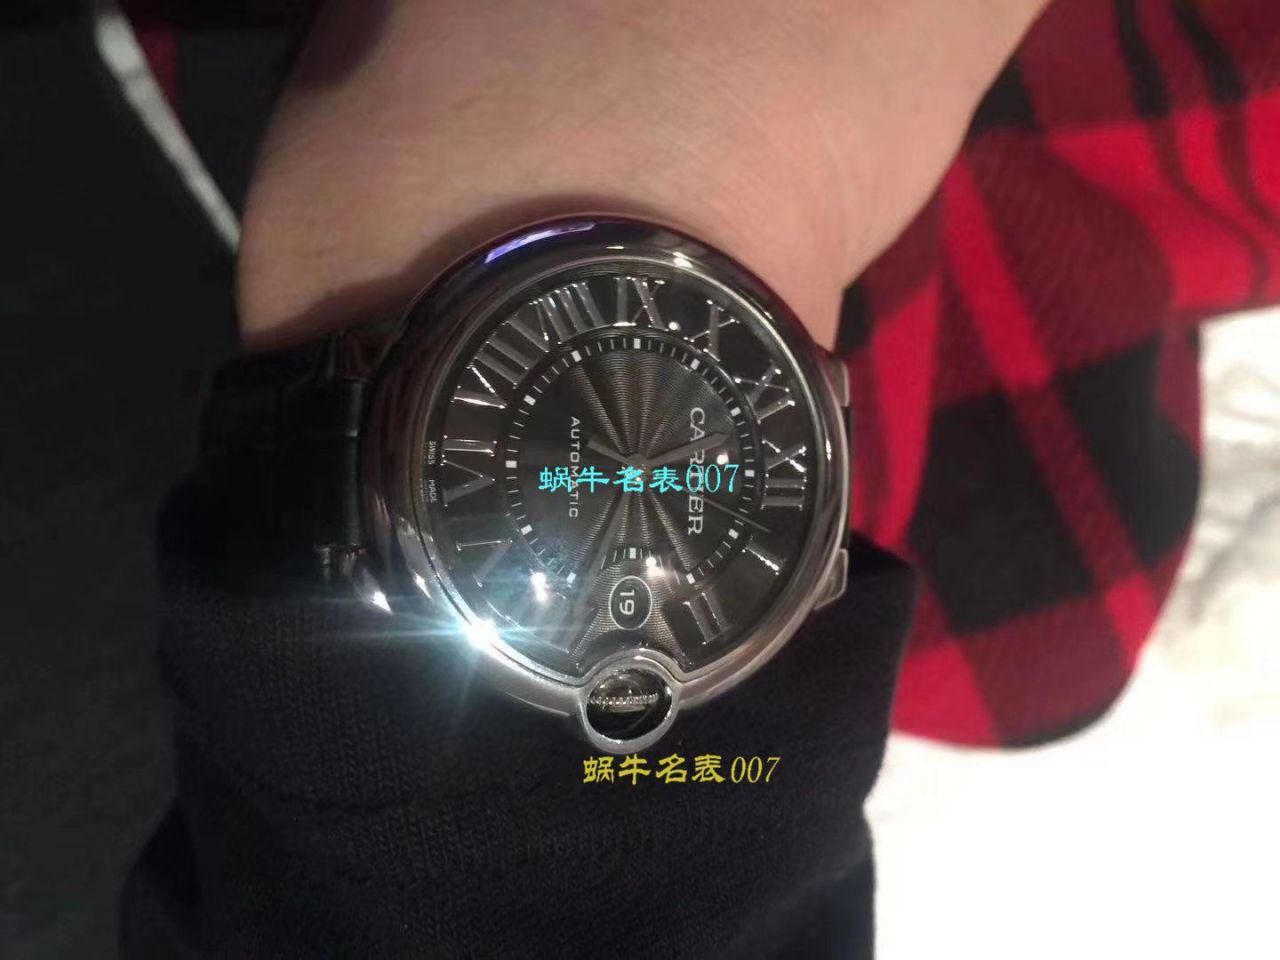 【HBBV6一比一超A复刻手表】卡地亚蓝气球系列WSBB0025腕表男装42毫米 / K175